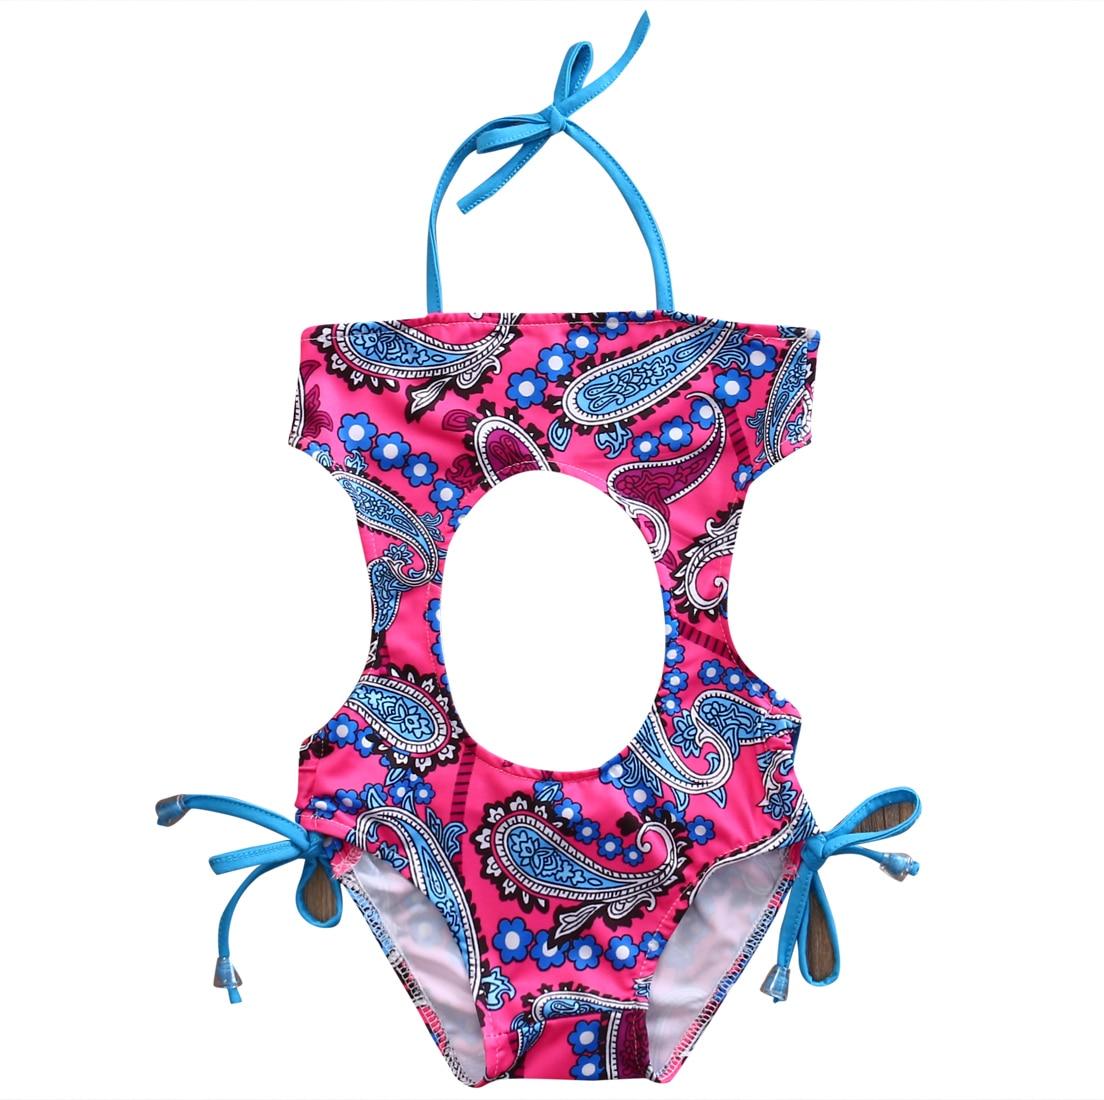 Hi Hi Baby Store Hi Hi Baby Store Baby Toddler Infant Kid Grils Bohemia Style Floral Print sleeveless Bikini  Bodysuits Swimsuit